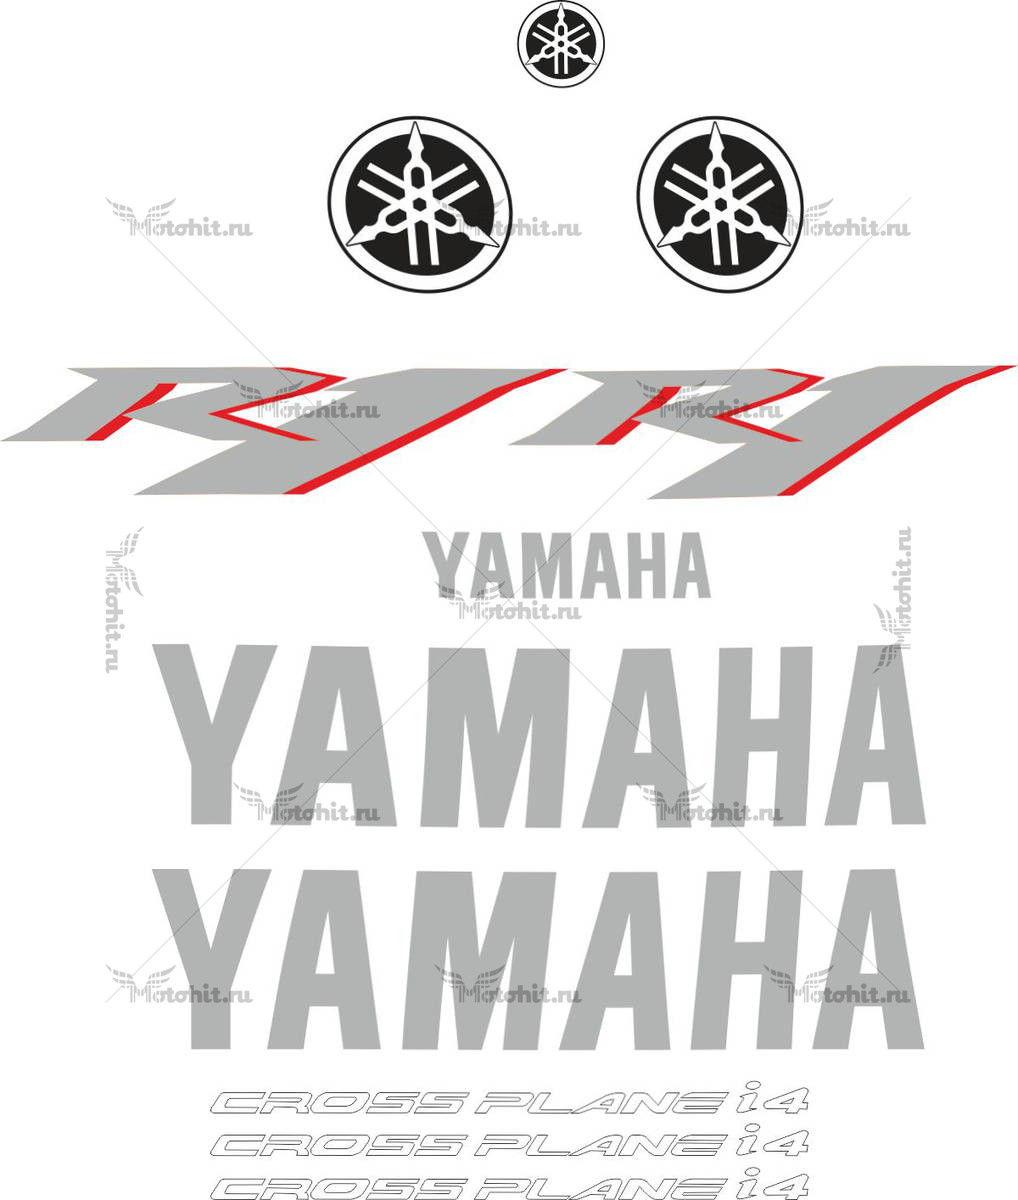 Комплект наклеек Yamaha YZF-R1 2009 SILVER-RED